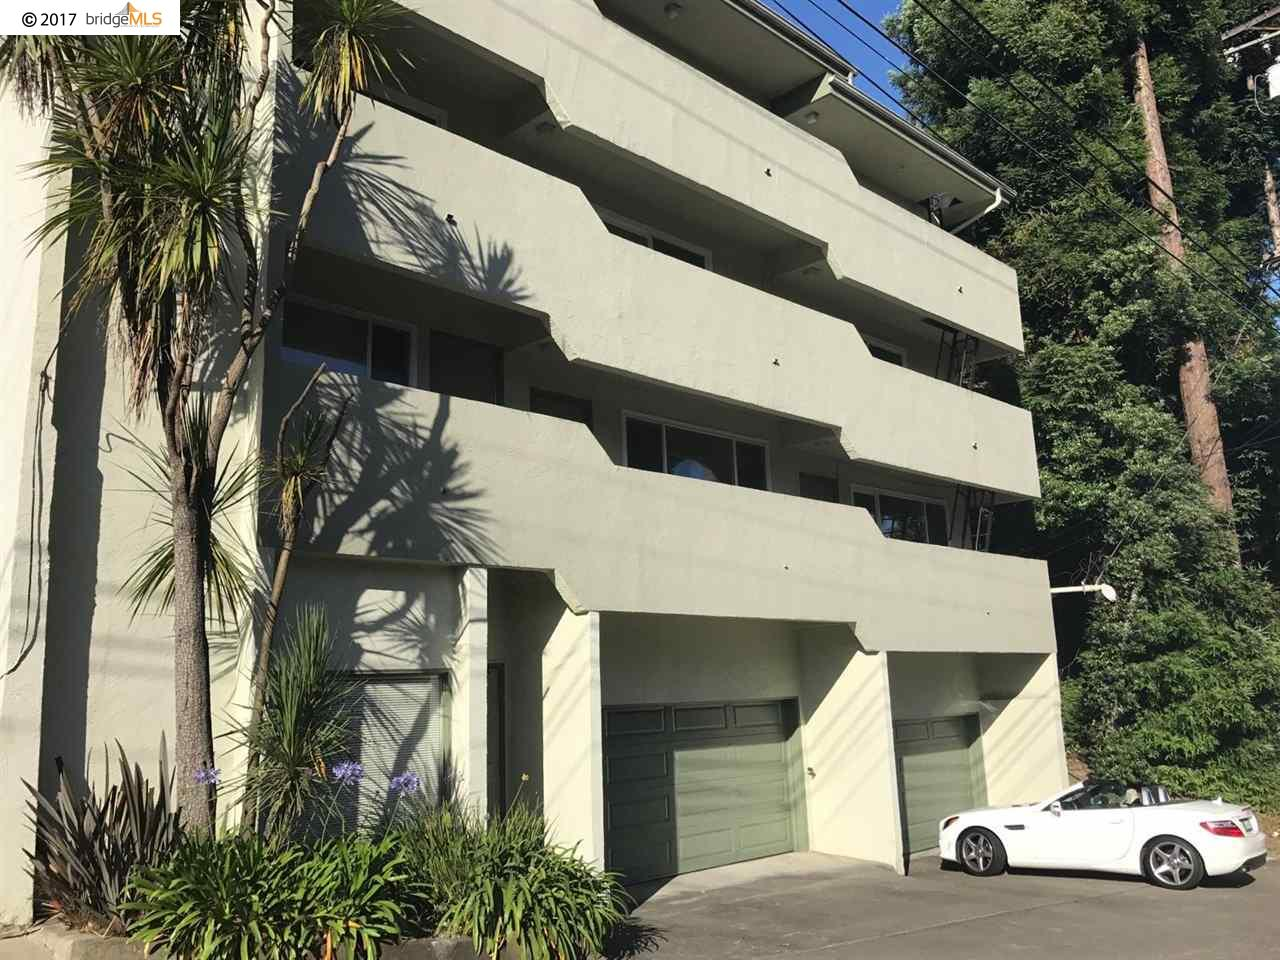 Casa Multifamiliar por un Venta en 655 Macarthur Blvd Oakland, California 94610 Estados Unidos